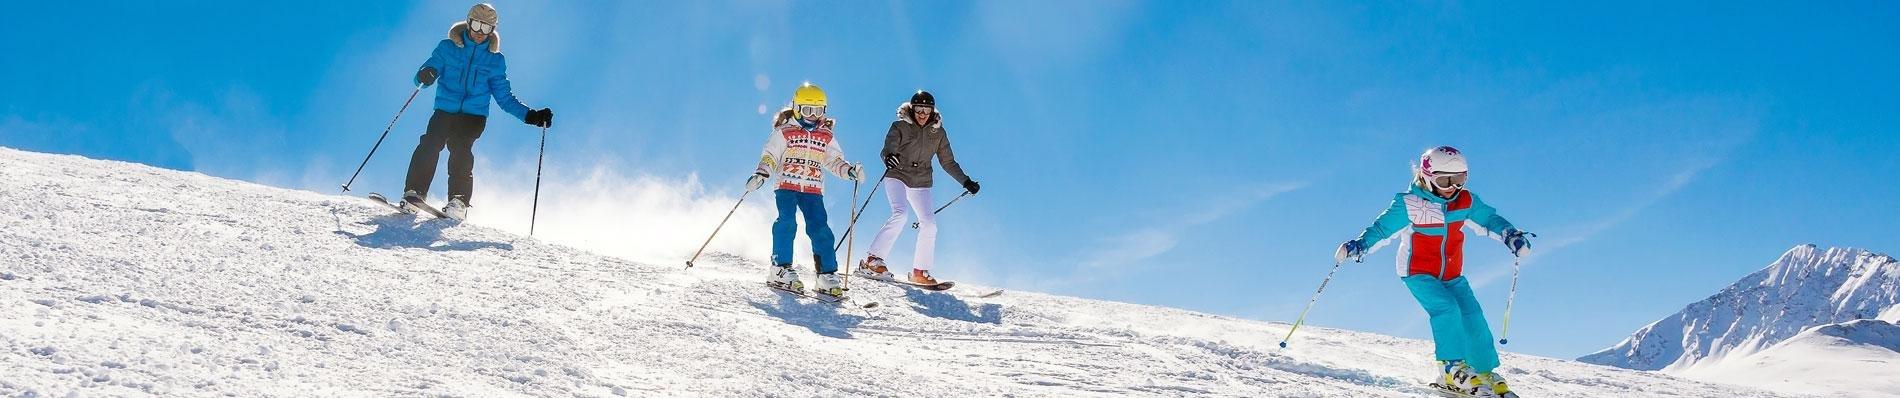 VALDISERE ski corona covid-19 gratis mondkapje skivakantie wintersport